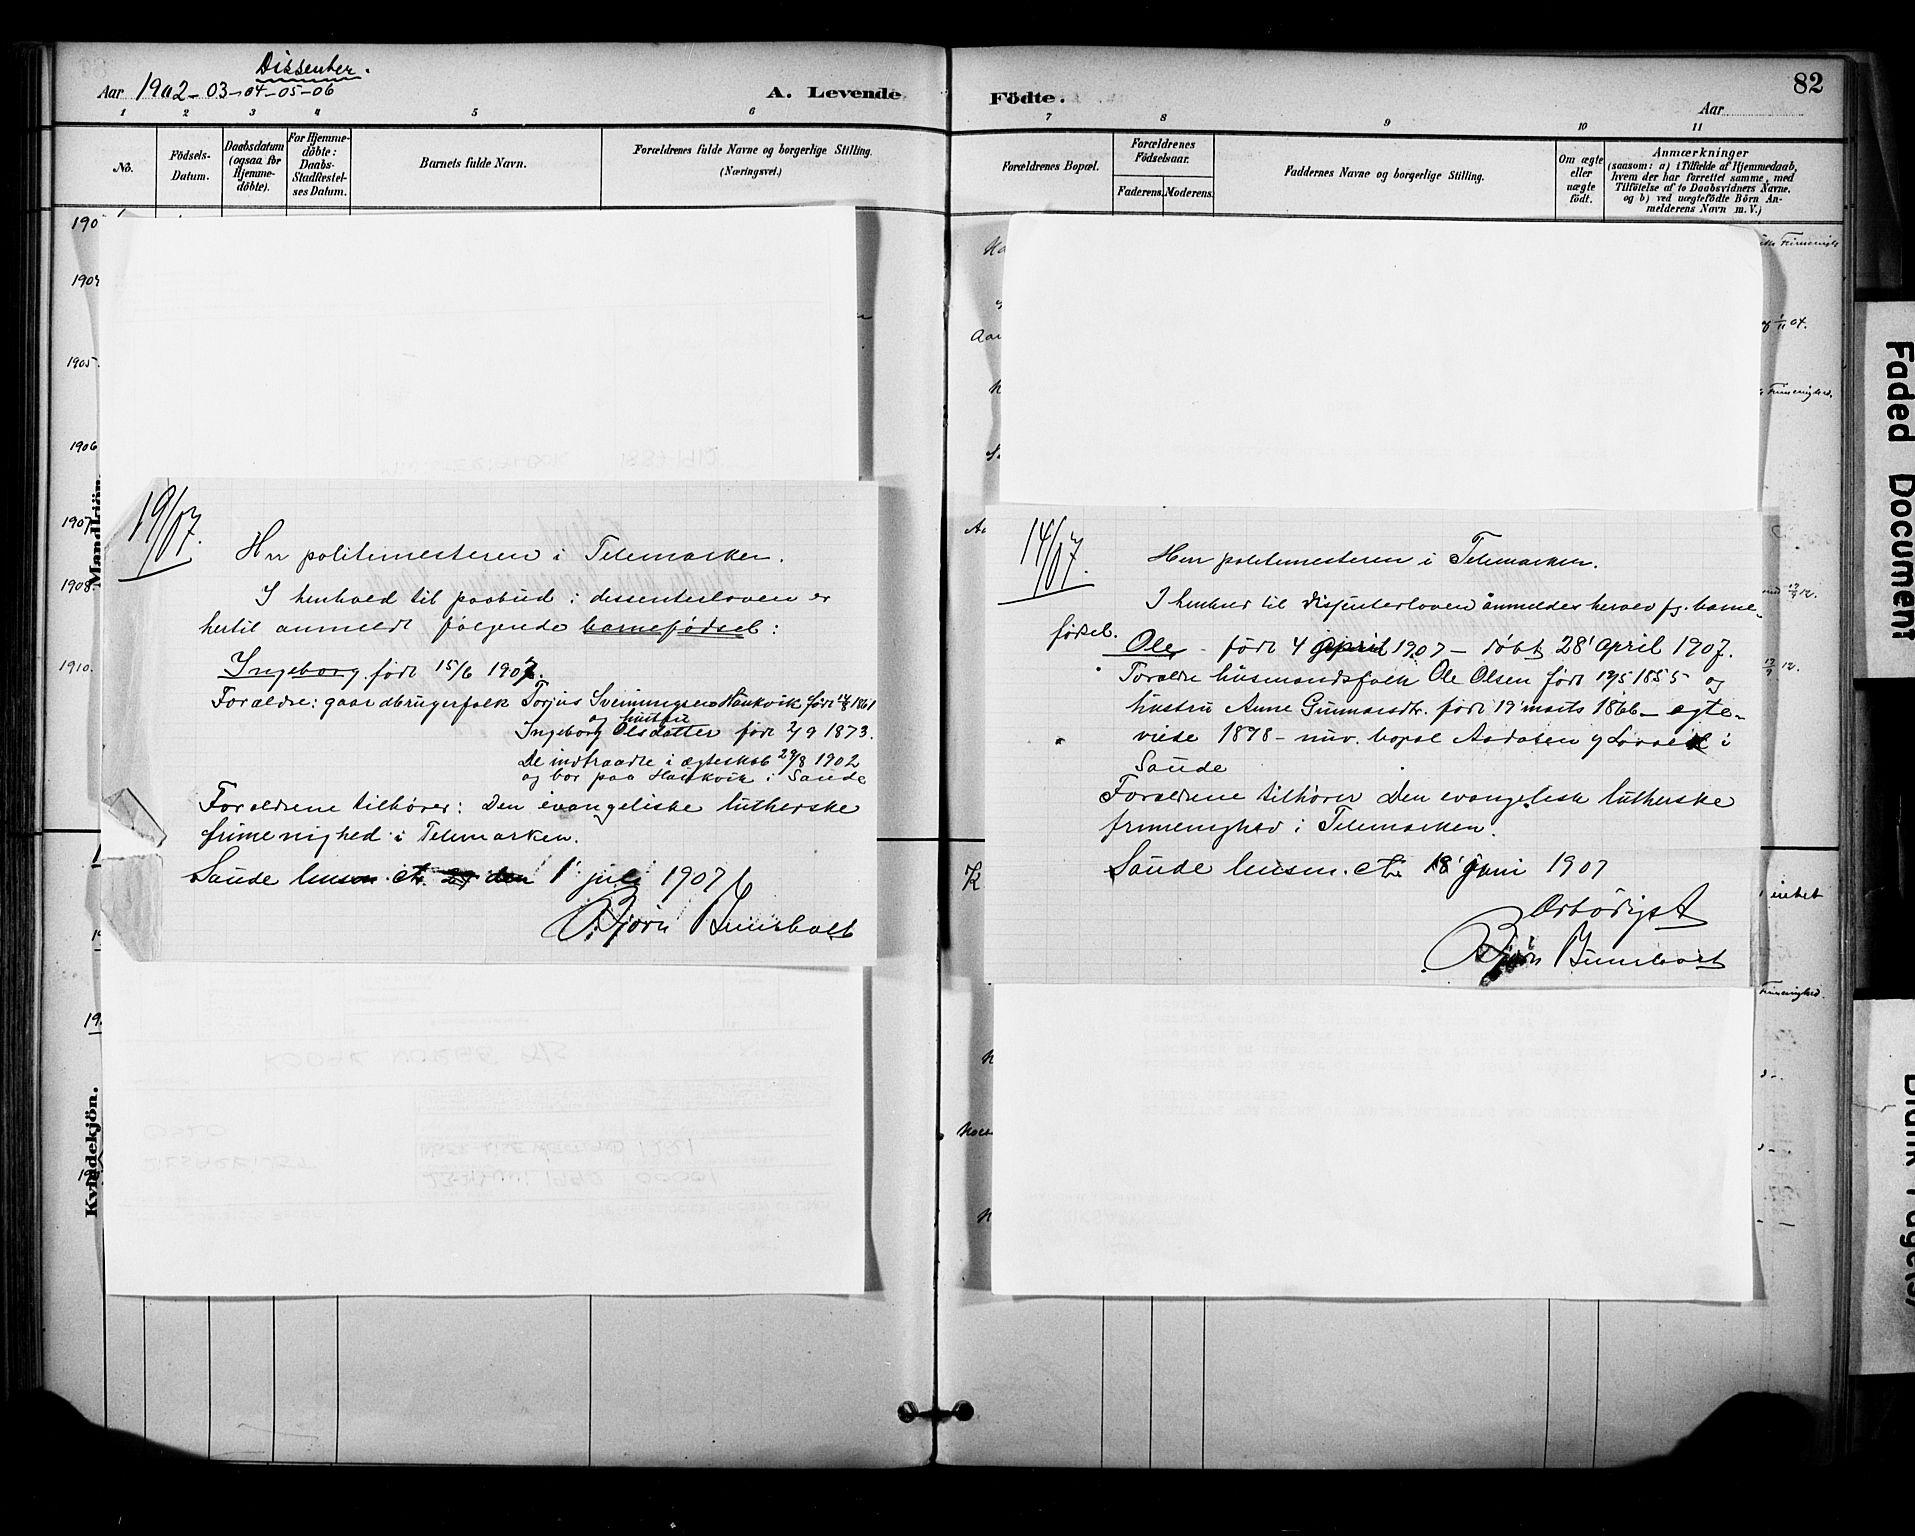 SAKO, Sauherad kirkebøker, F/Fa/L0009: Ministerialbok nr. I 9, 1887-1912, s. 82